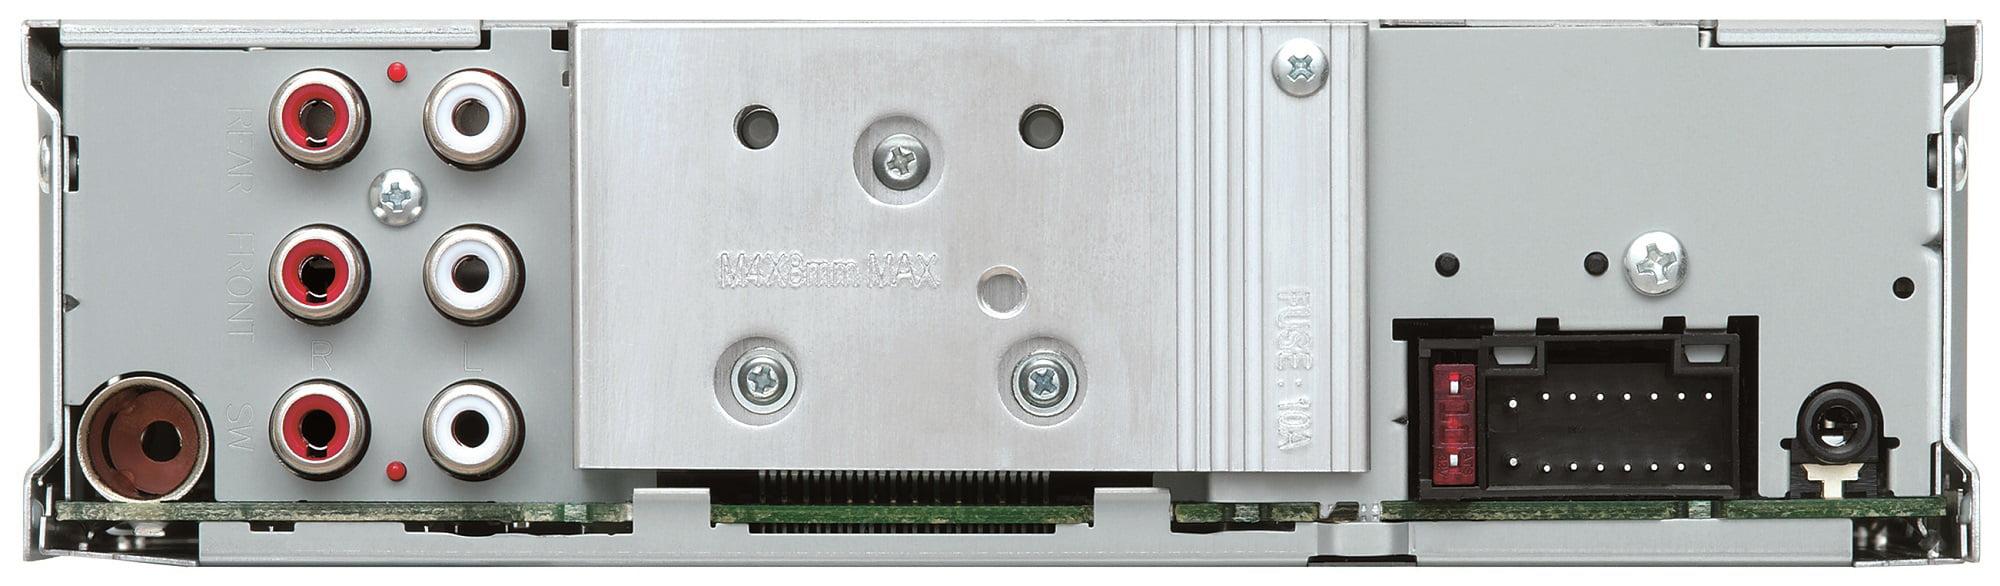 e25001ff fabf 4bf7 ba0a 7be6aa9302c9_1.d890d73e0a2ae4f381c6a6ecab062950 kenwood kdc bt330u in dash am fm cd receiver with built in kenwood kdc 210u wiring diagram at gsmx.co